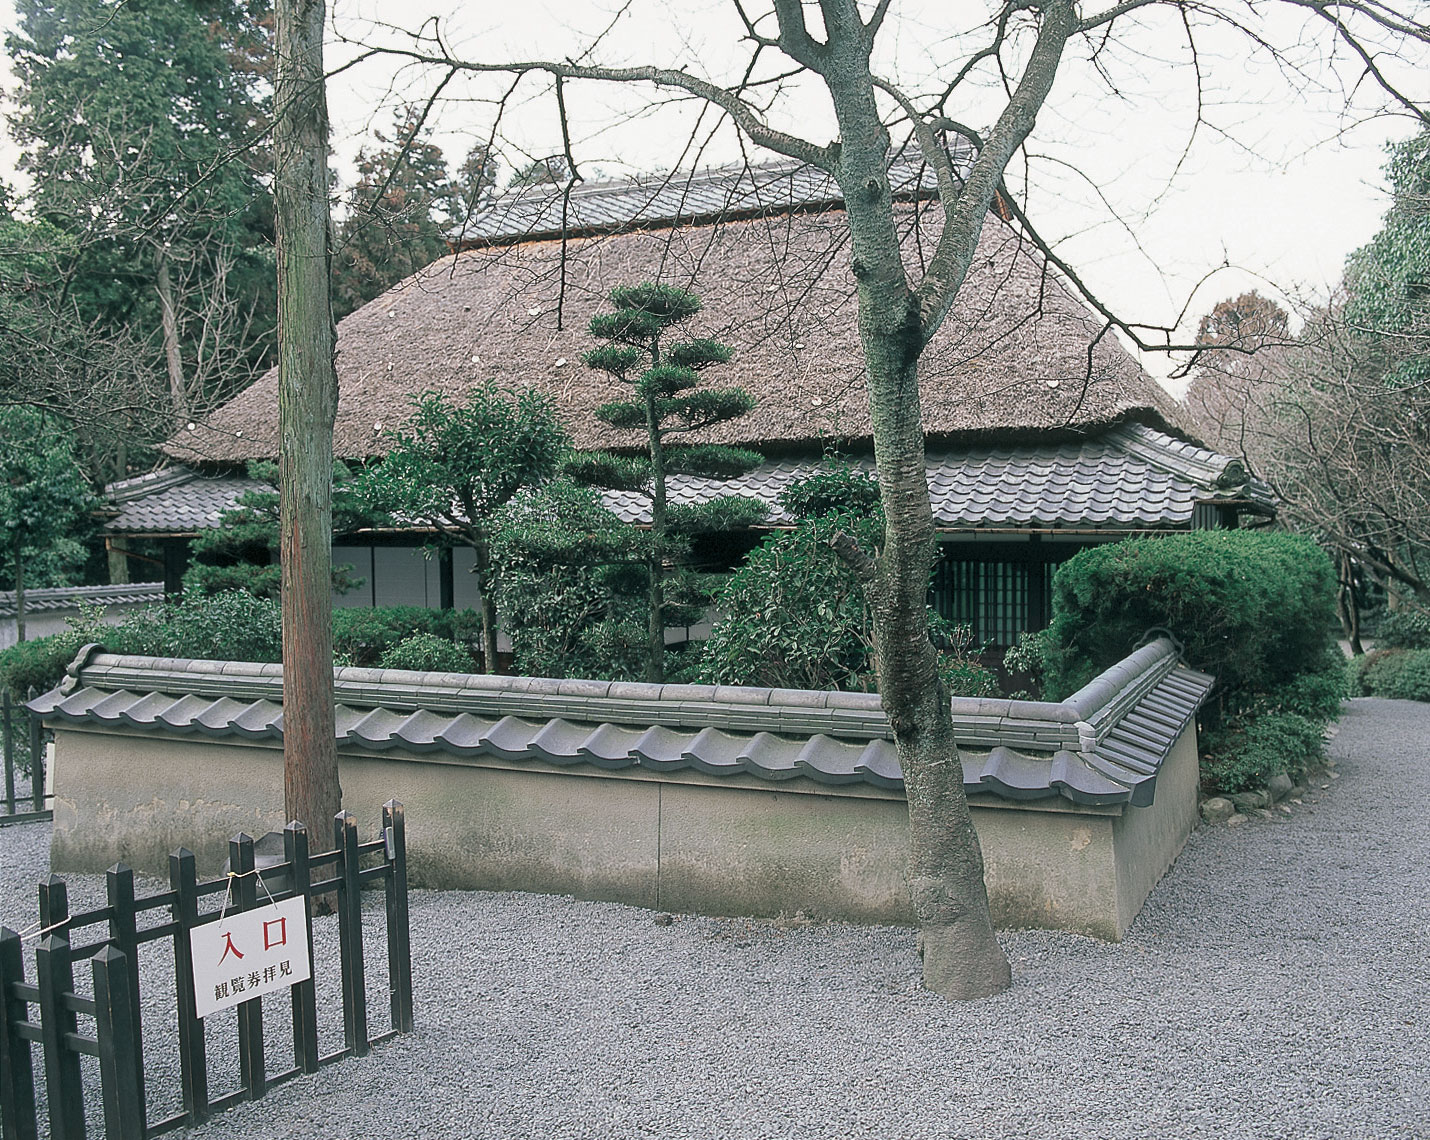 伊贺流忍者(NINJA)博物馆